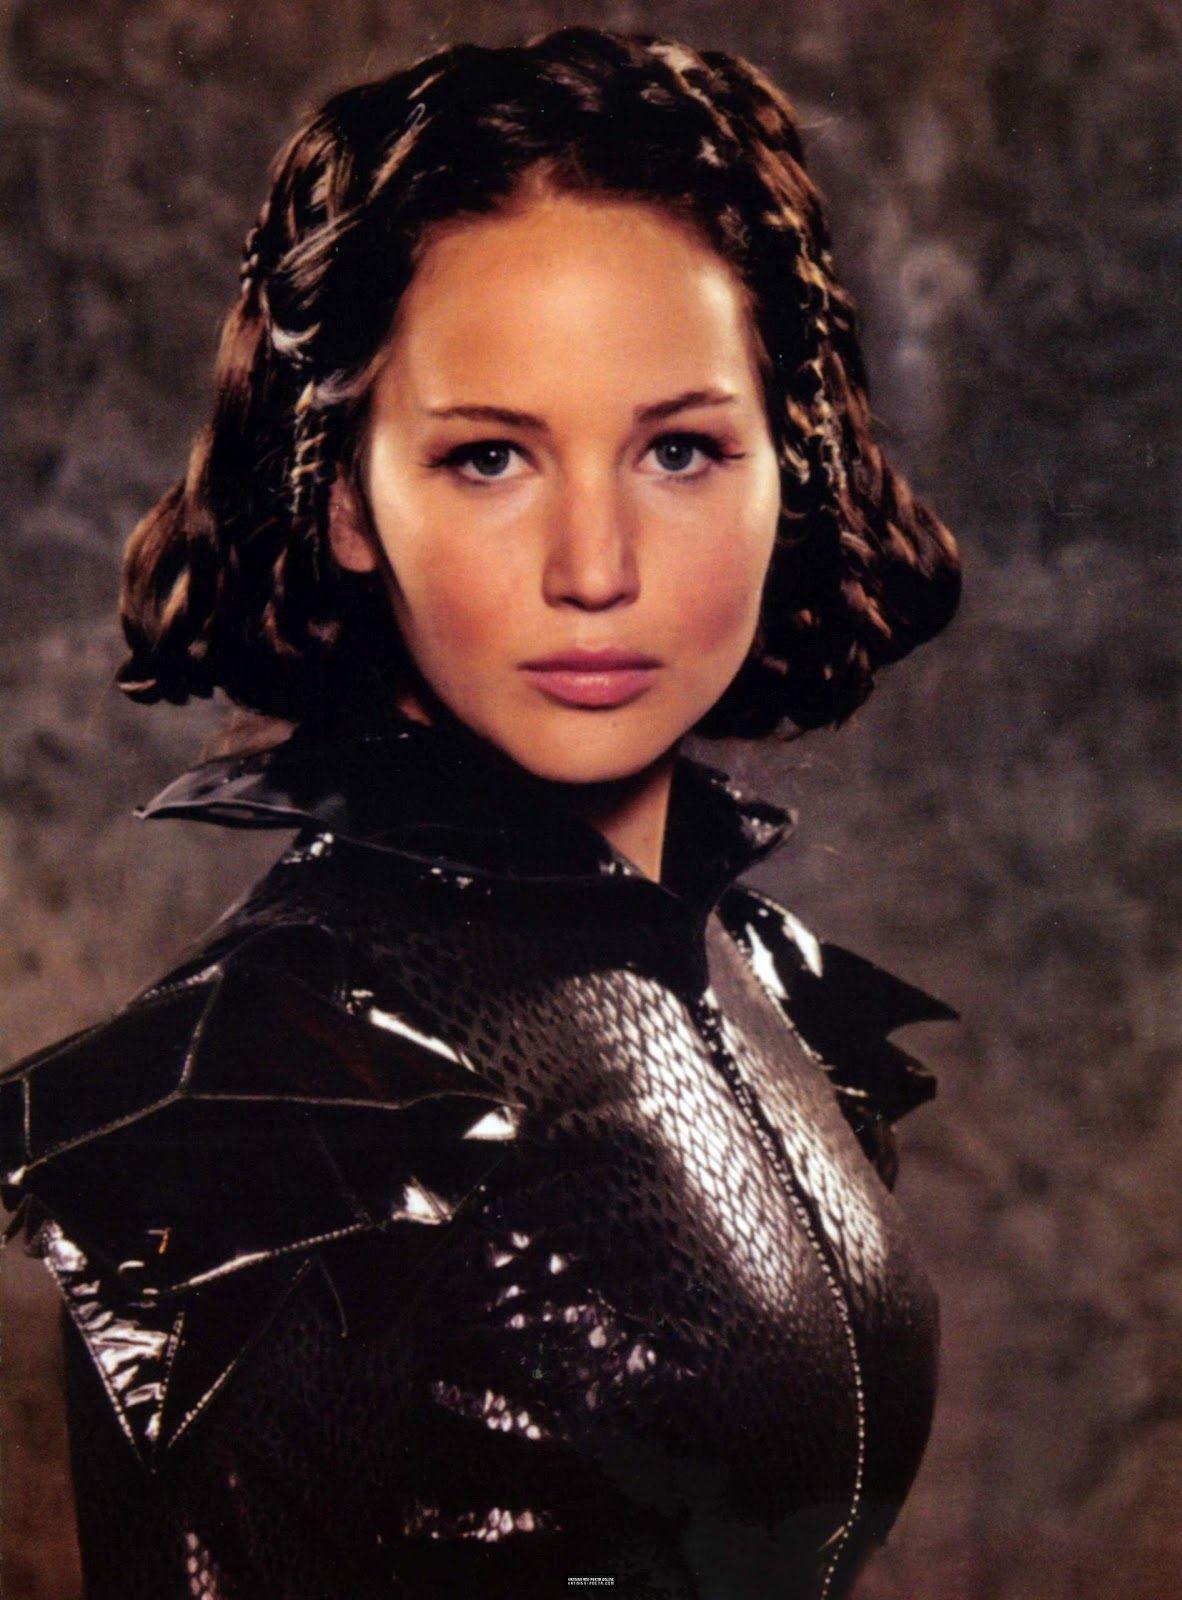 Rebelu0027s Haven Veru0027s Costume Journal Katniss Research  sc 1 st  Pinterest & Rebelu0027s Haven: Veru0027s Costume Journal: Katniss Research | Girl on ...